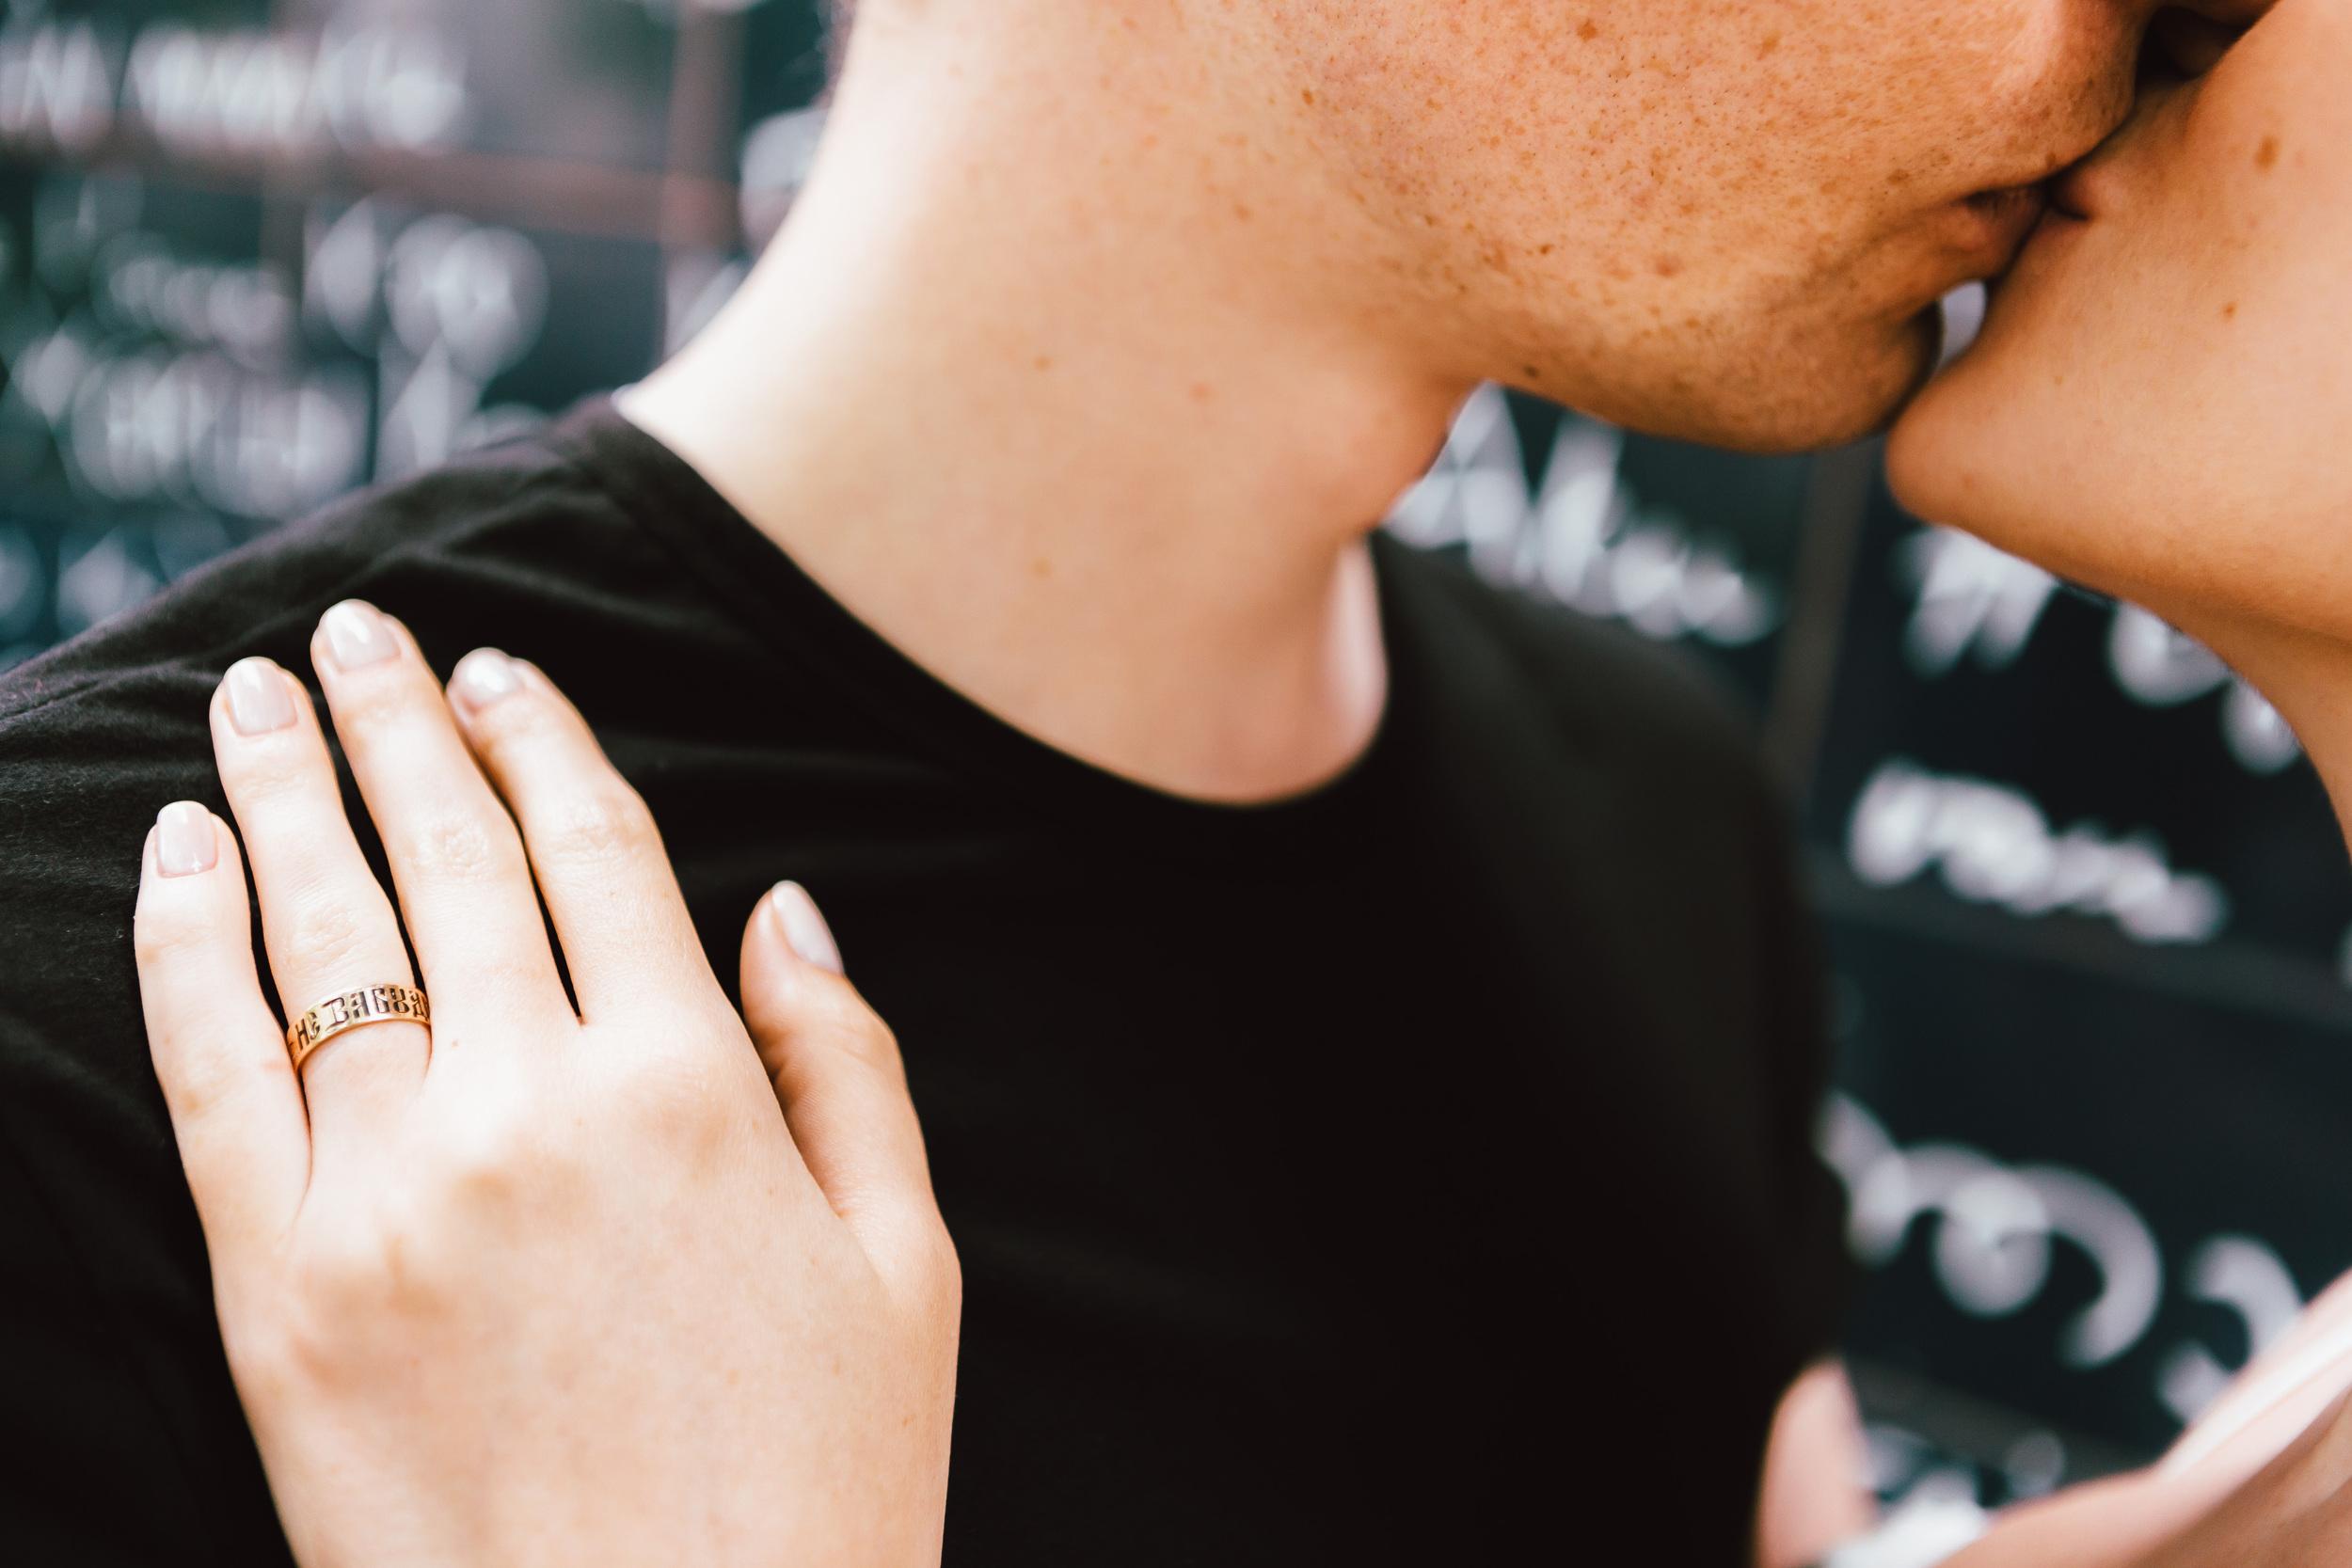 Photographer in Paris, Montmartre, Lovestory, kiss, iheartparisfr